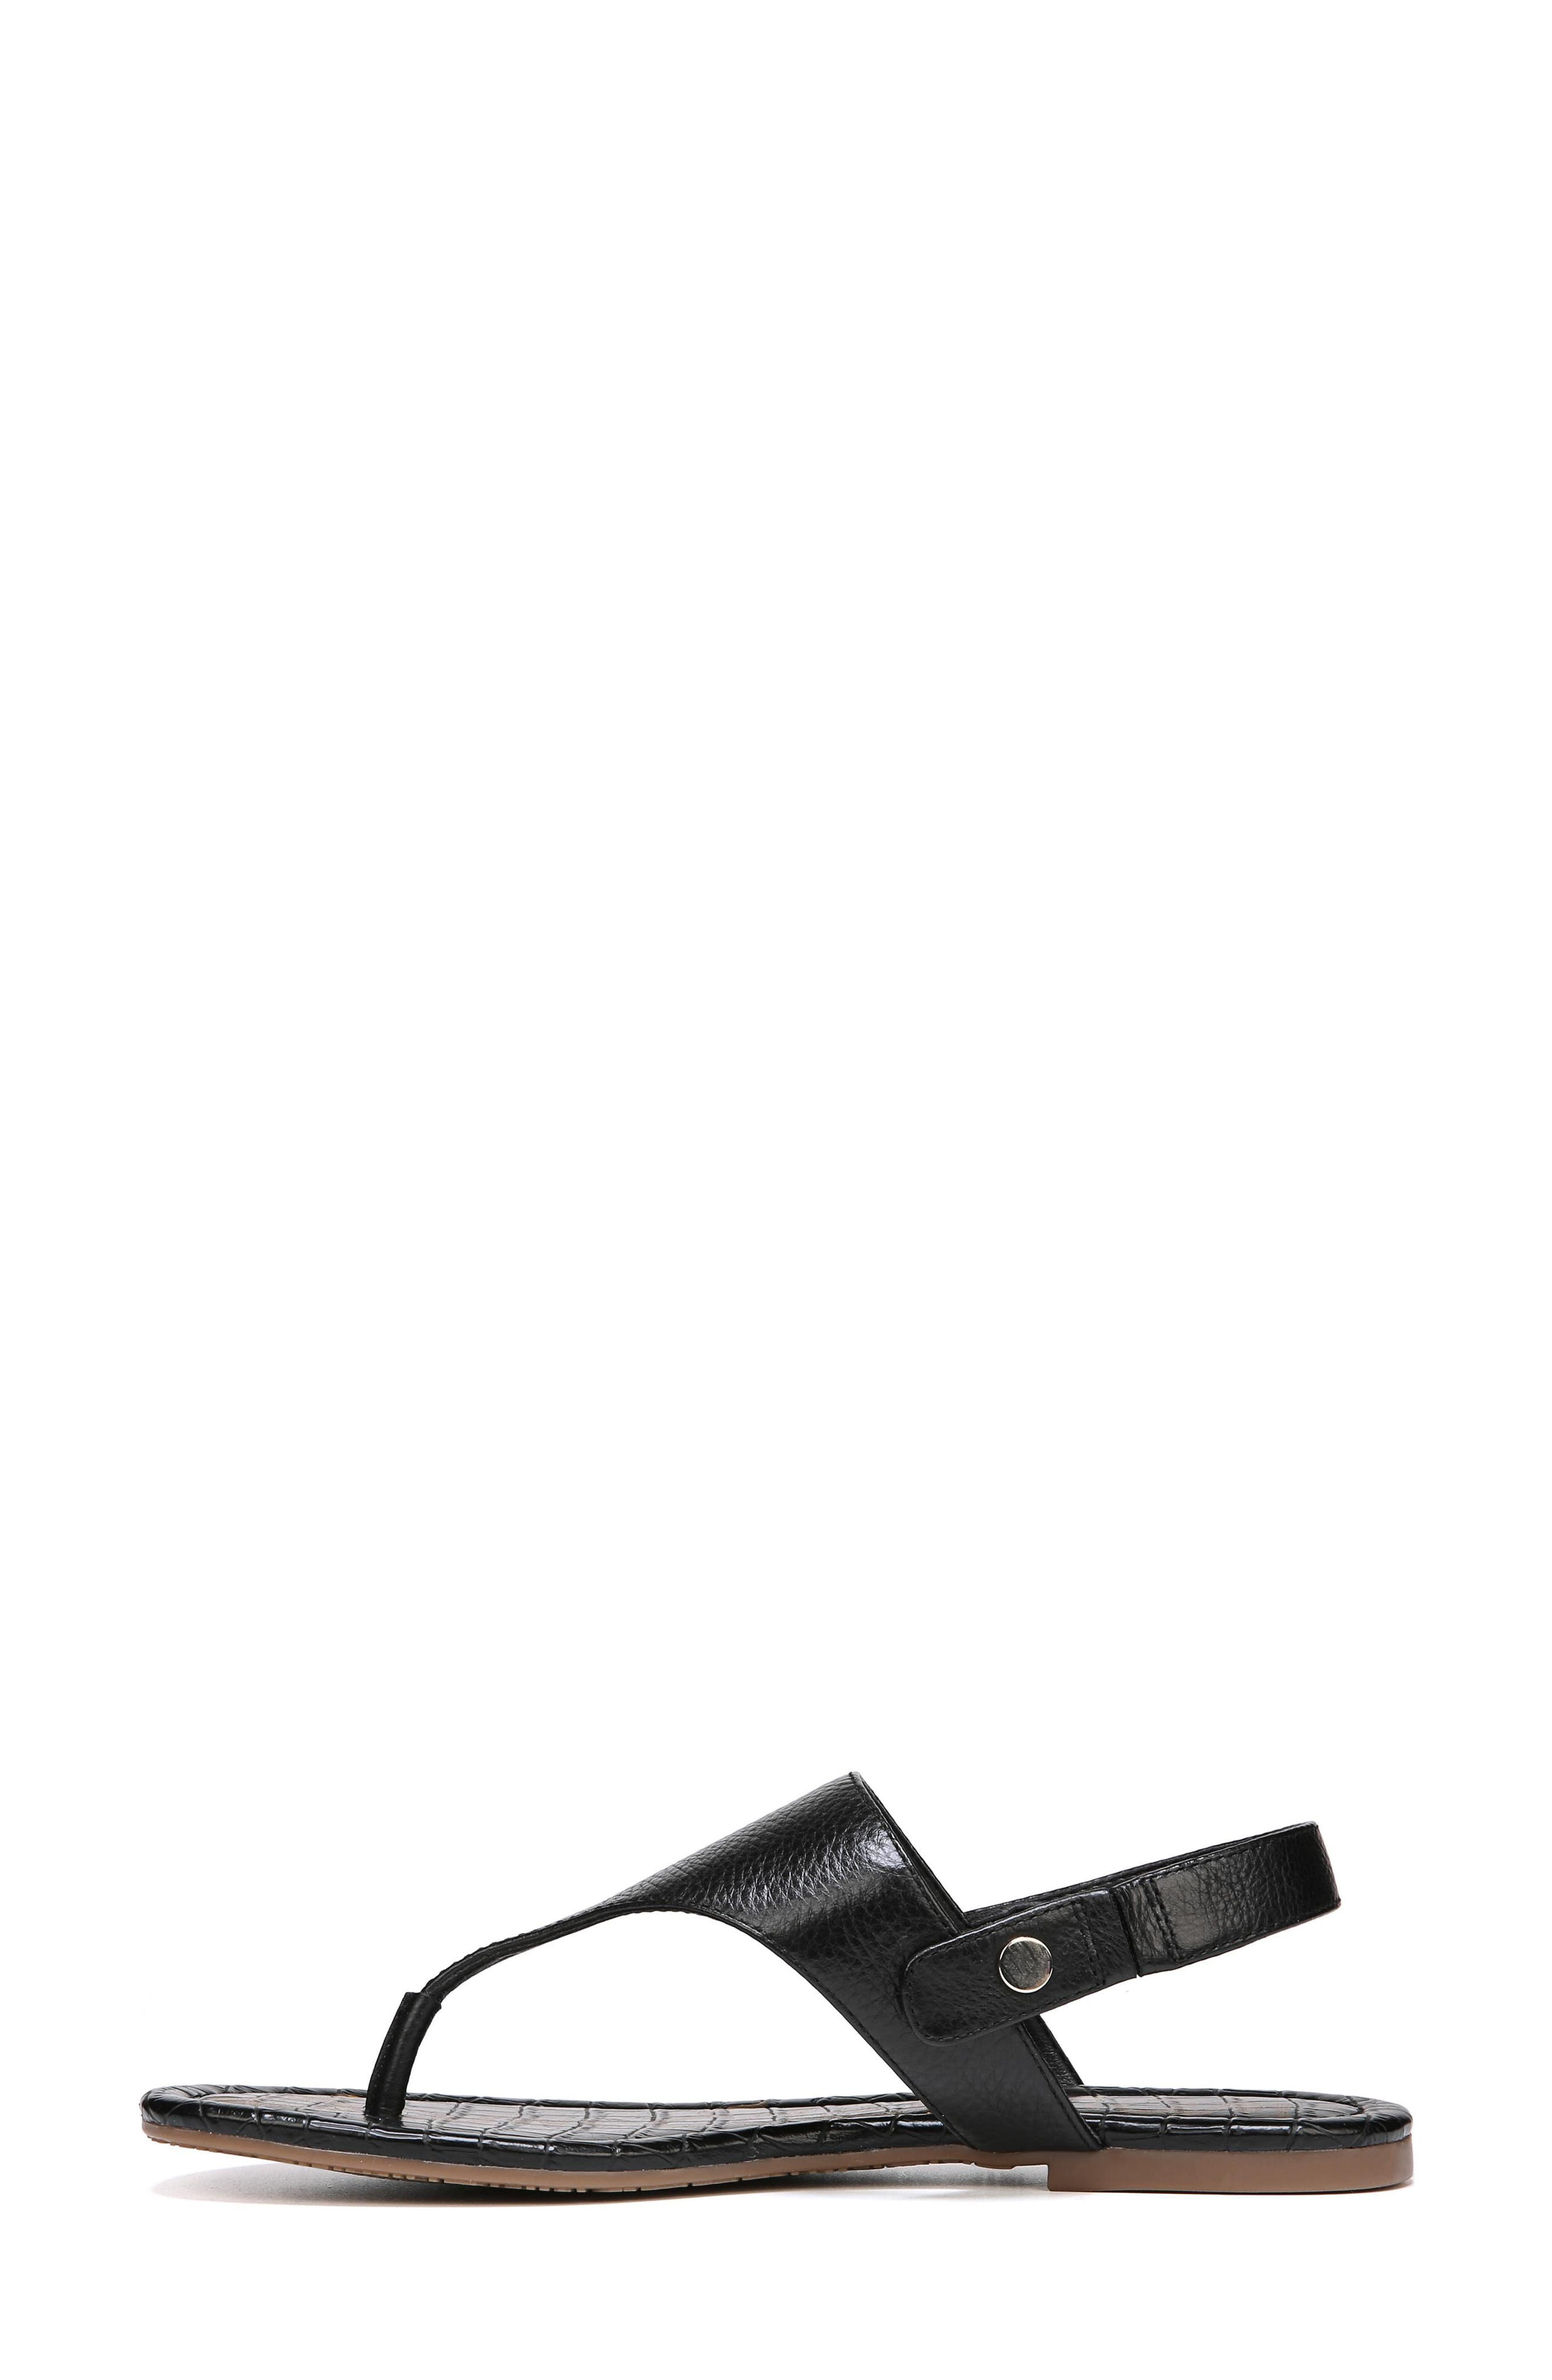 Cason Sandal,                             Alternate thumbnail 3, color,                             001